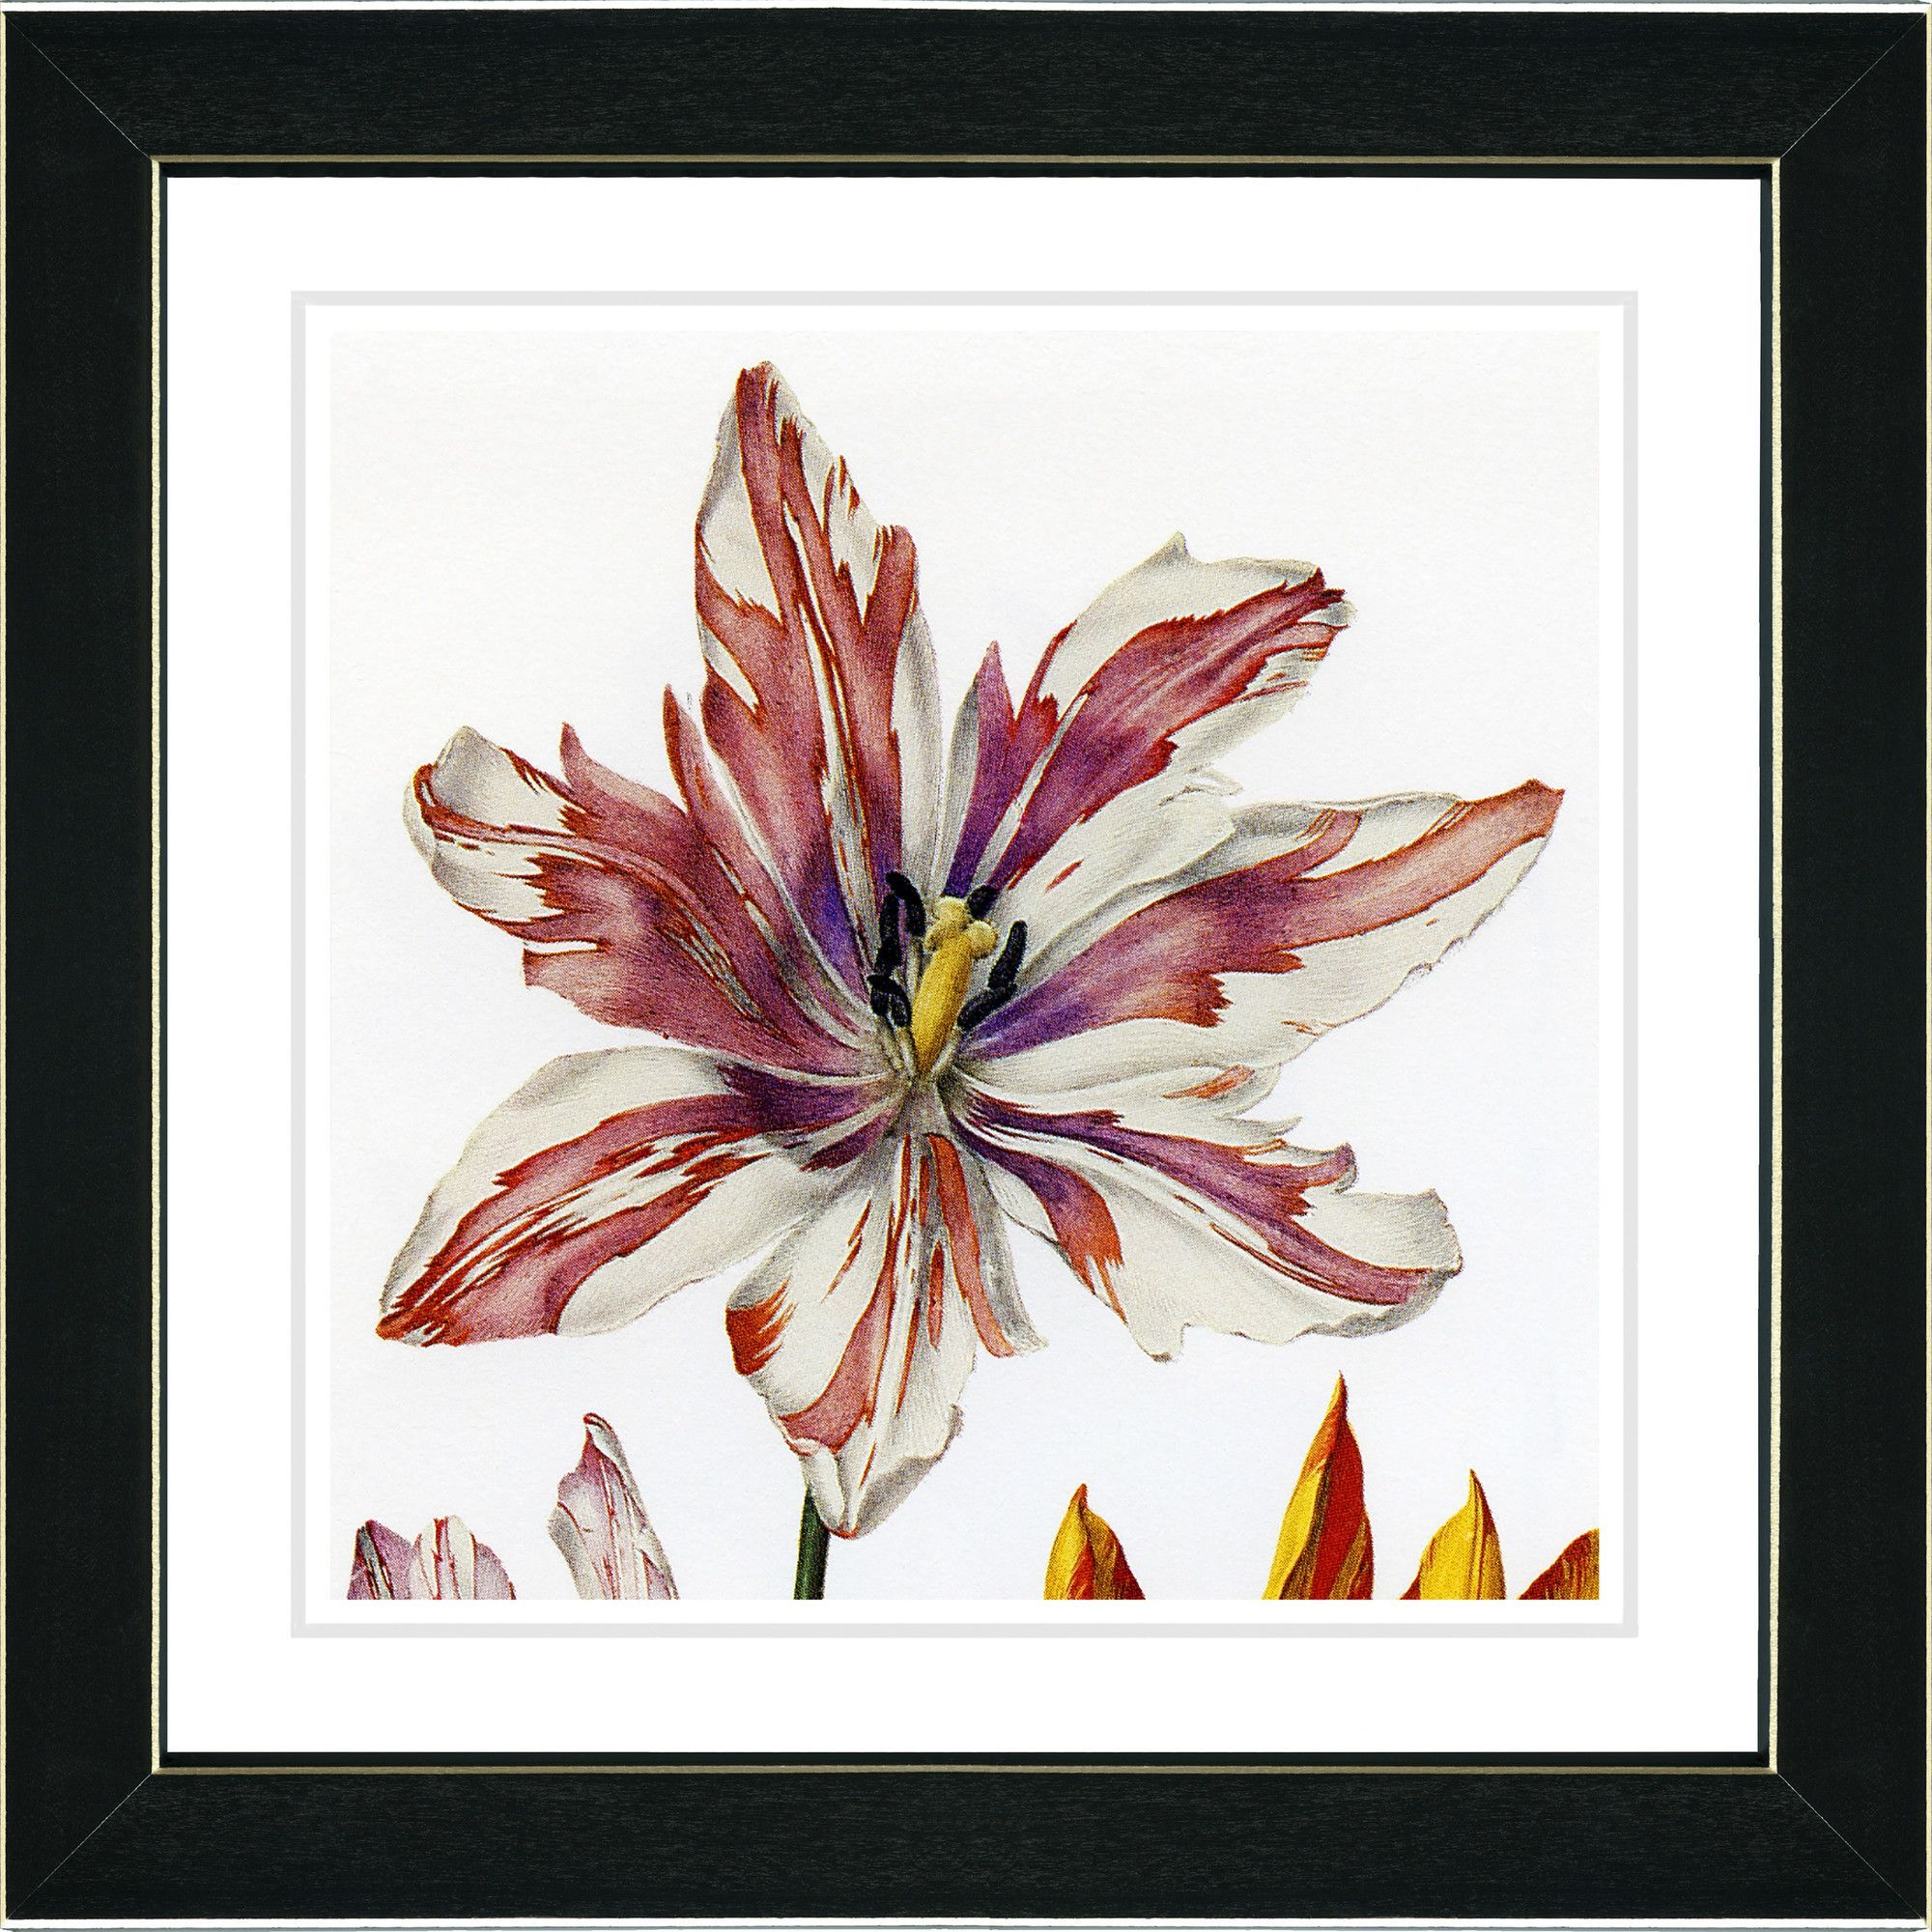 Vintage Botanical No. 24W by Zhee Singer Framed Giclee Print Fine Wall Art